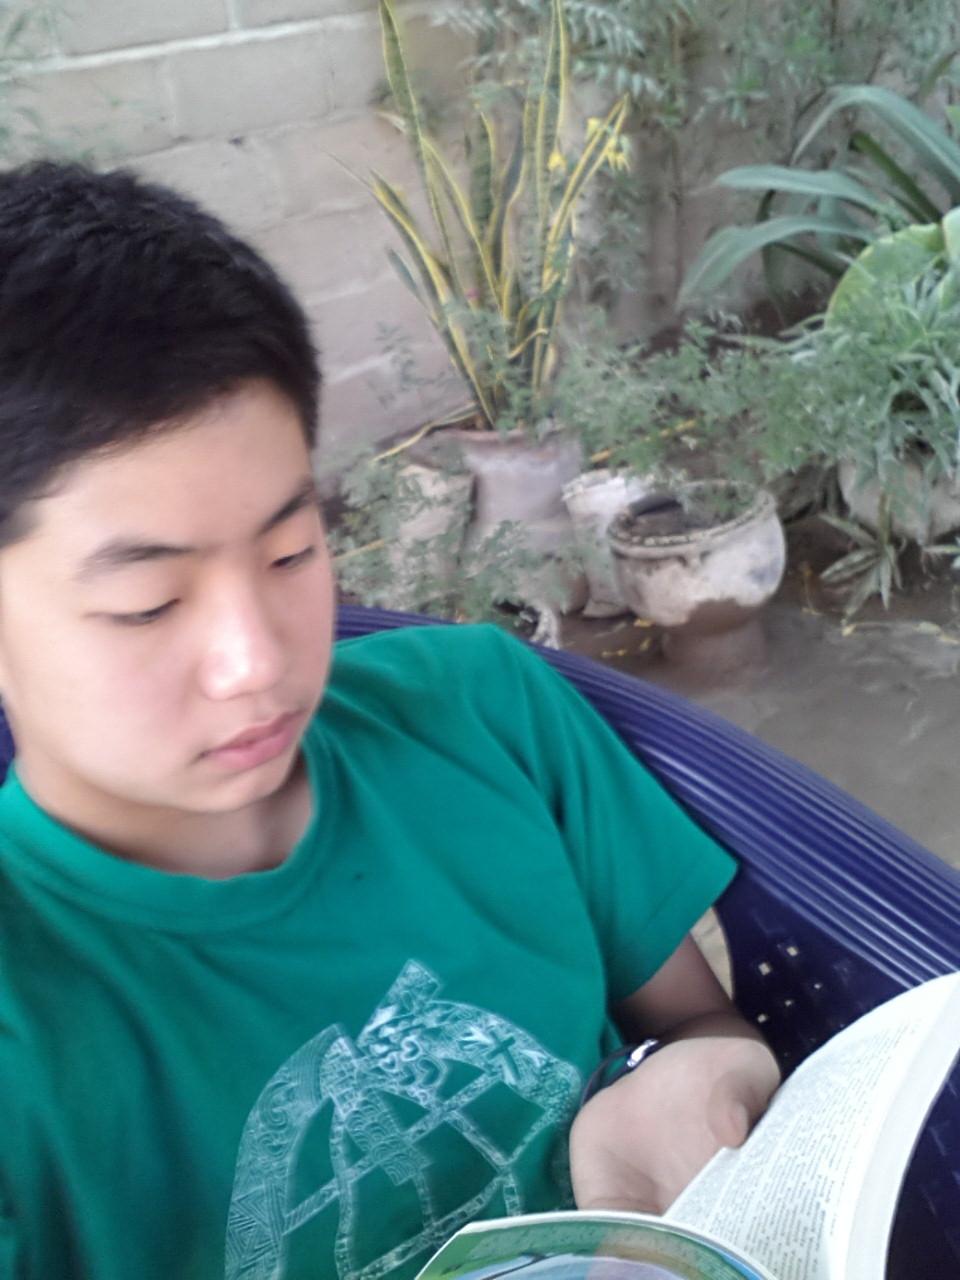 Korean lad reading Dernier book